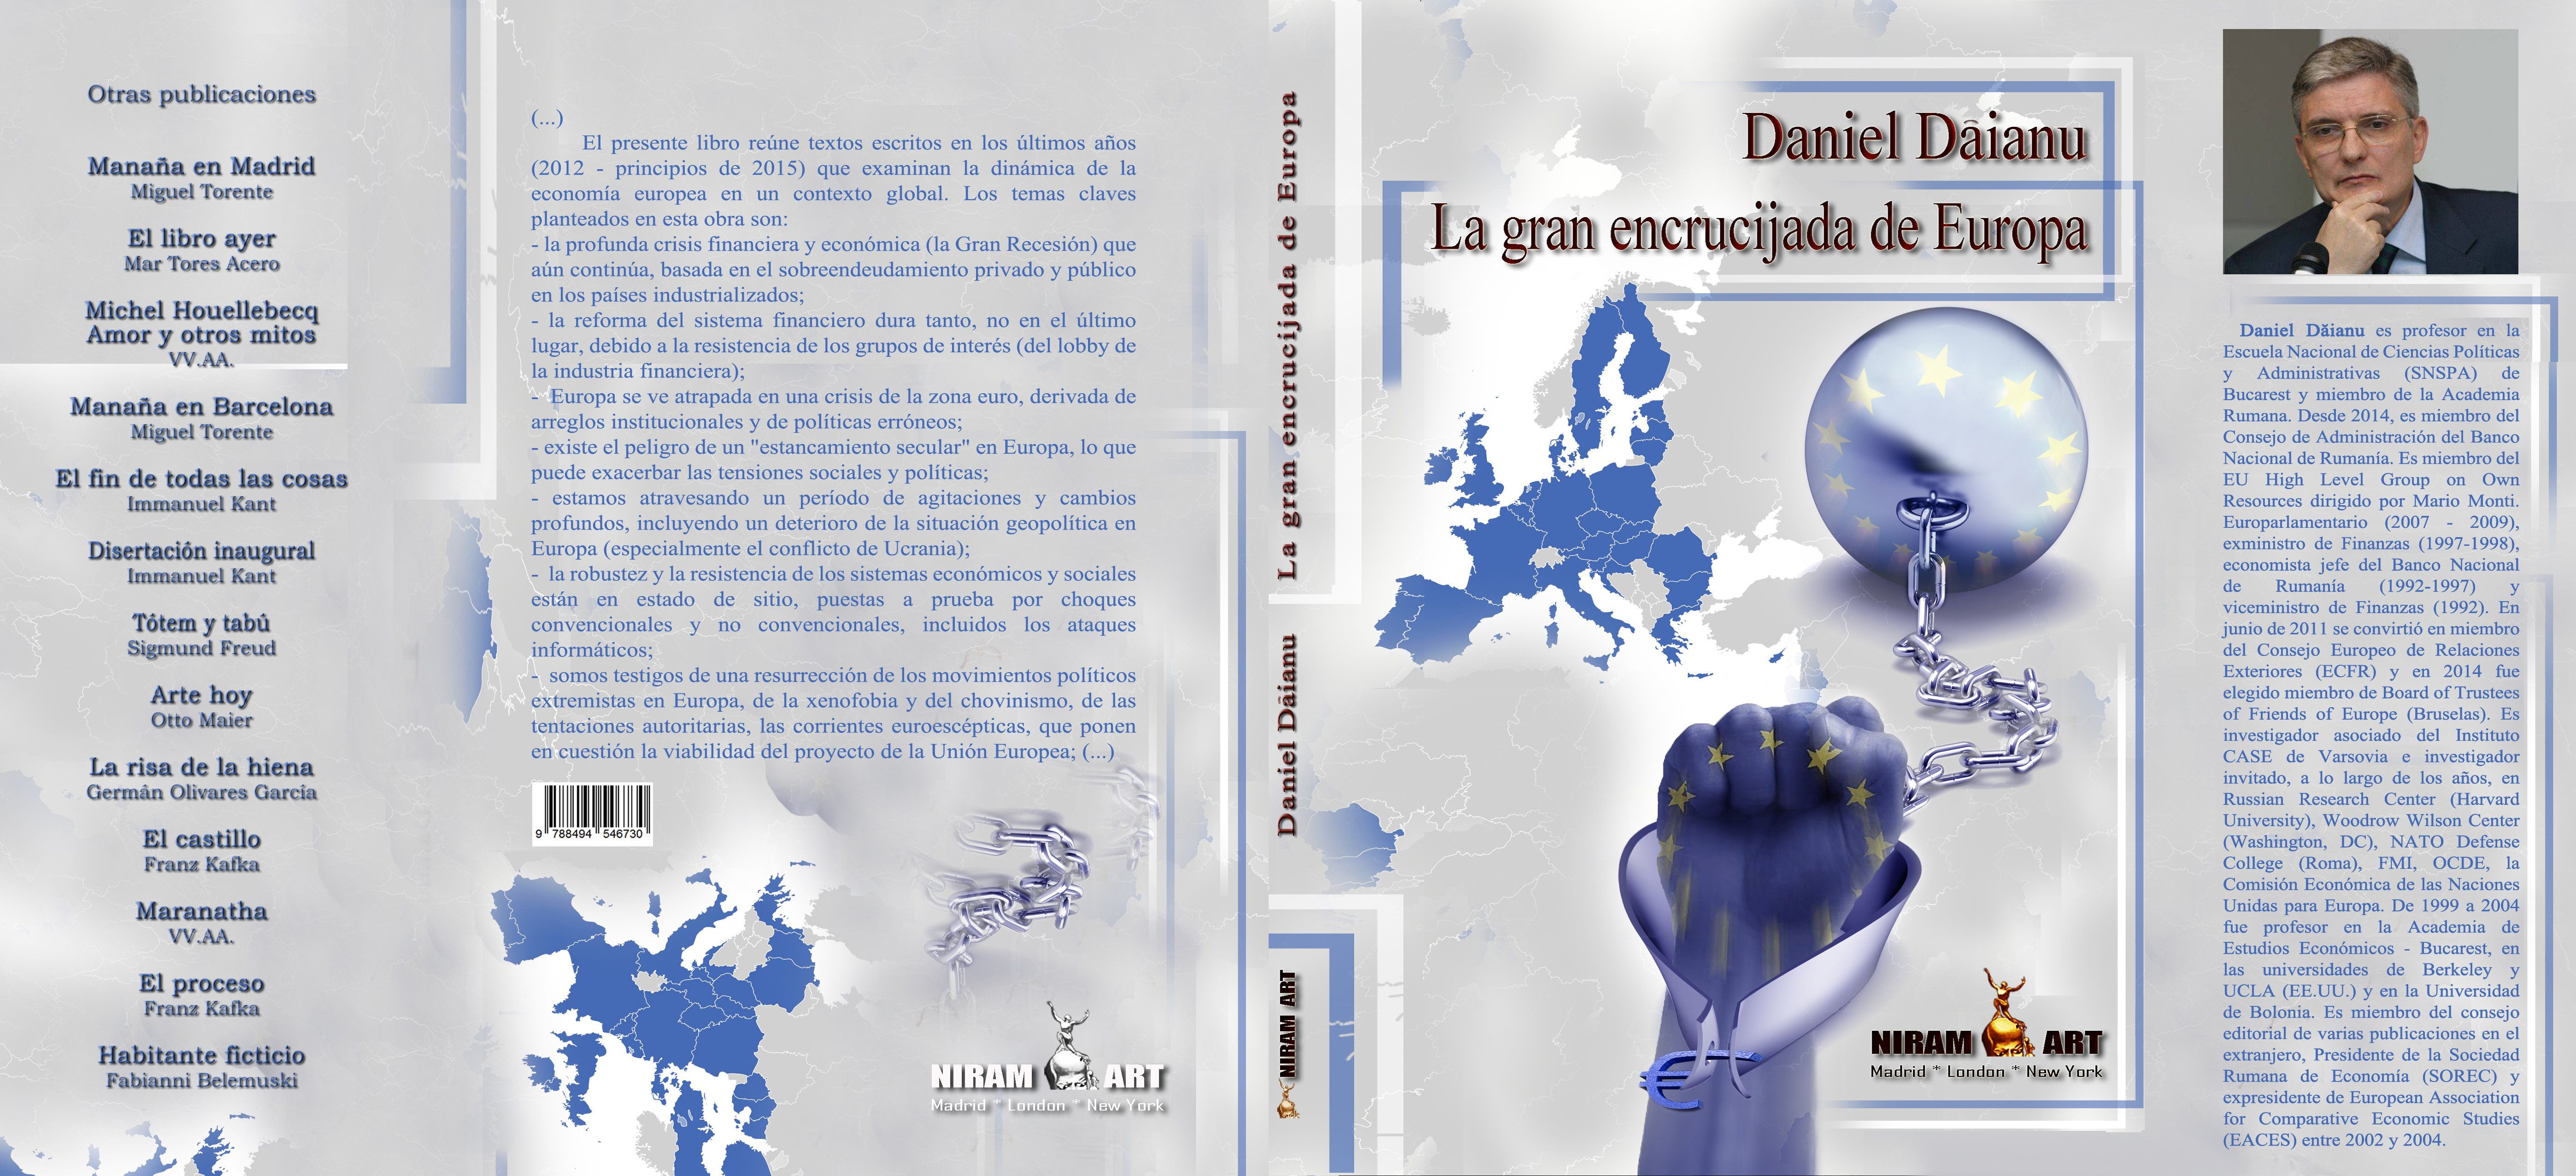 http://revista22.ro/files/news/manset/default/Portada-La-gran-encrucijada-de-Europa---Daniel-Daianu.jpg